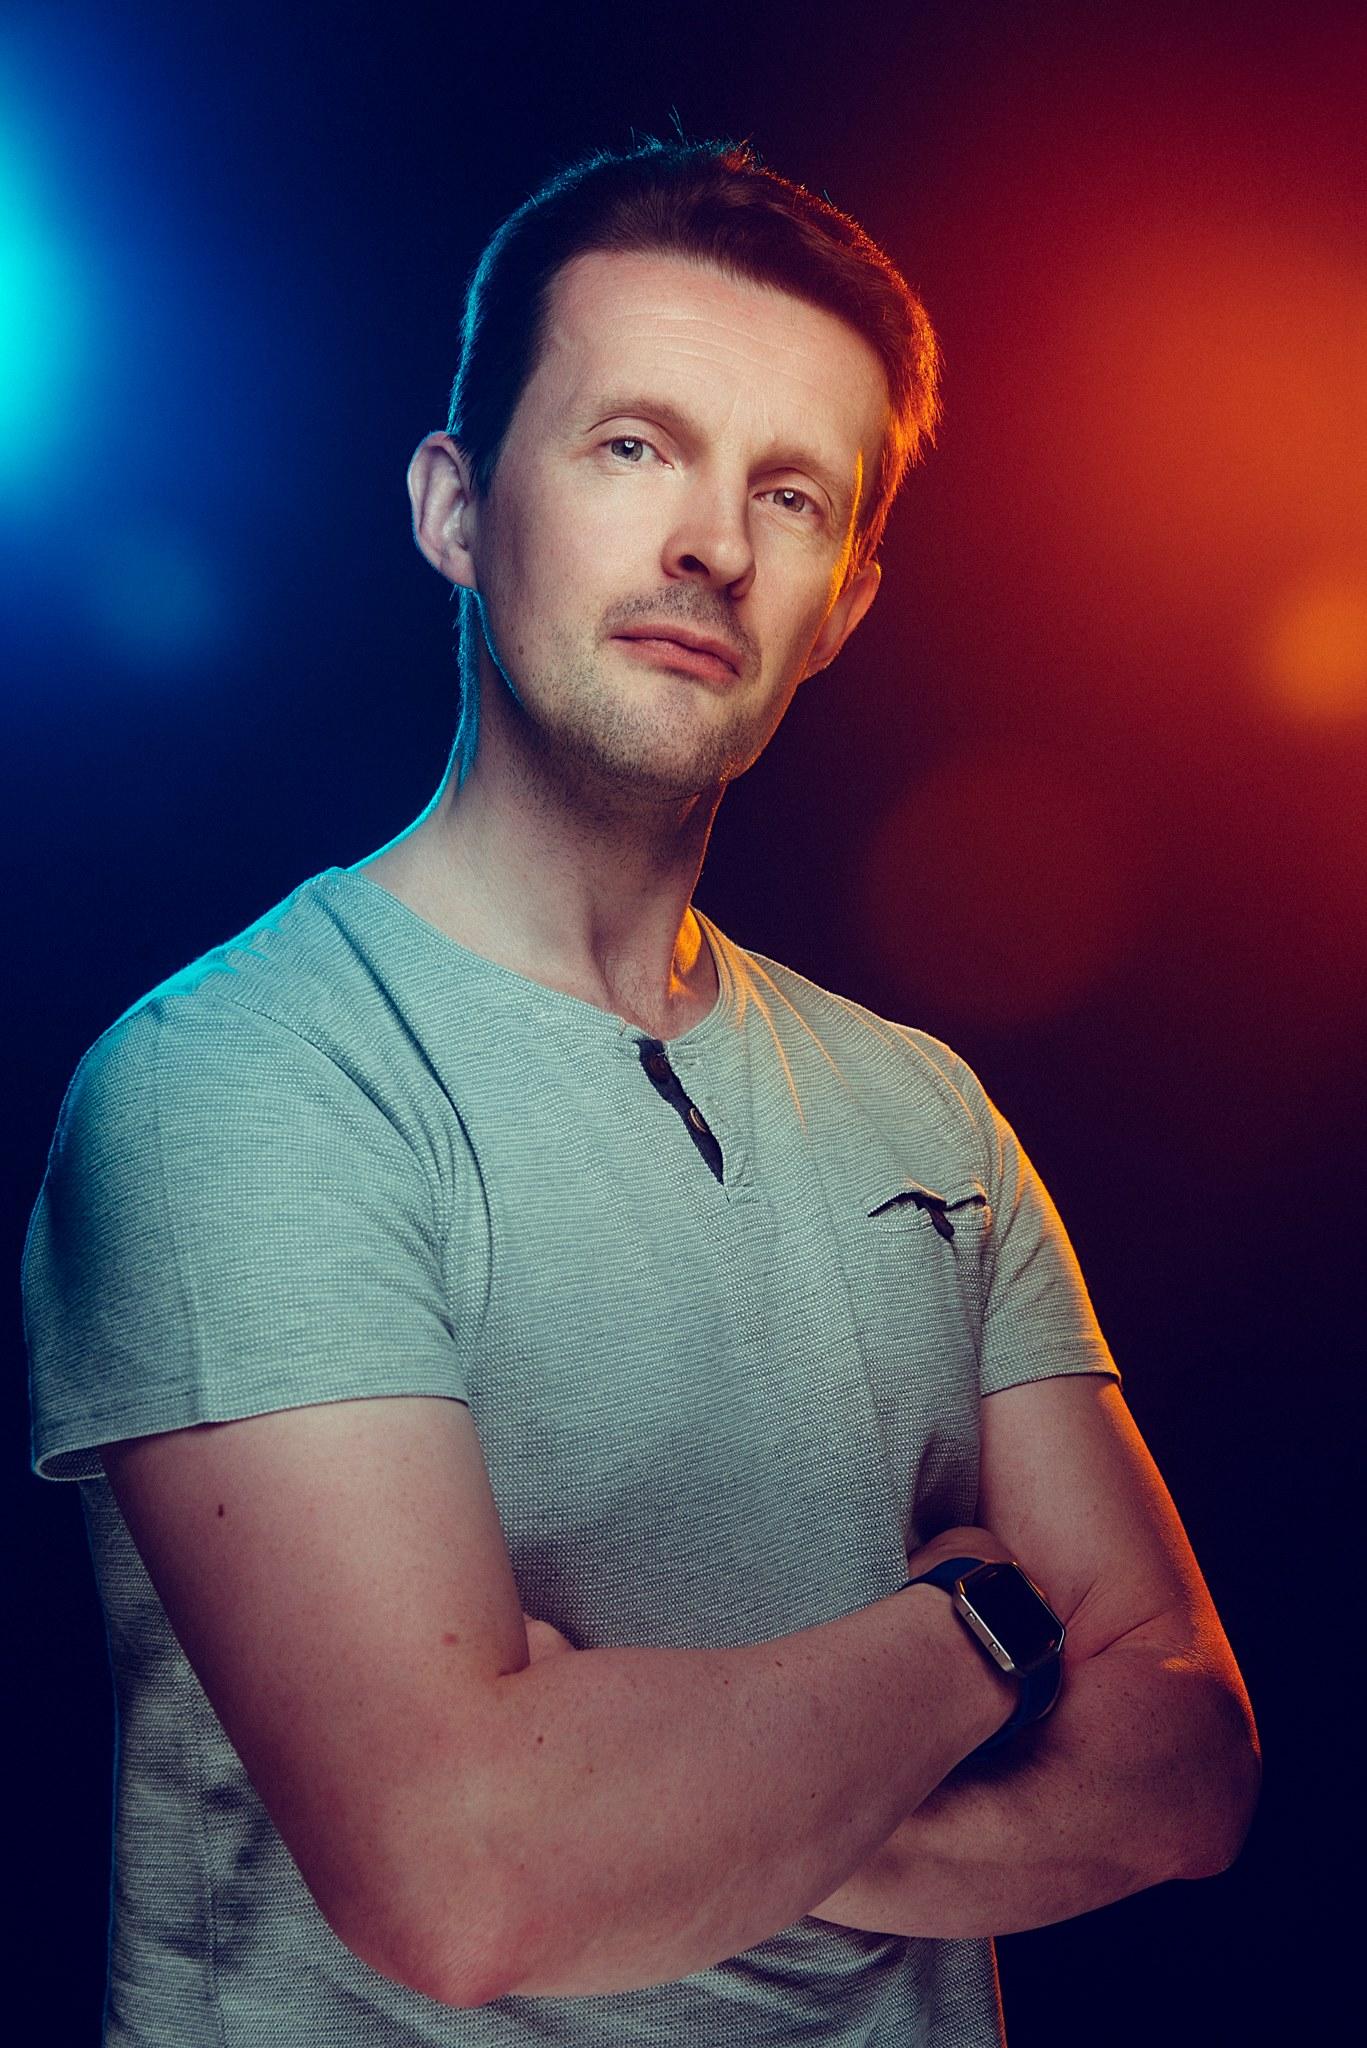 Portrait taken by Jake Hicks, master of gel photography.   http://jakehicksphotography.com